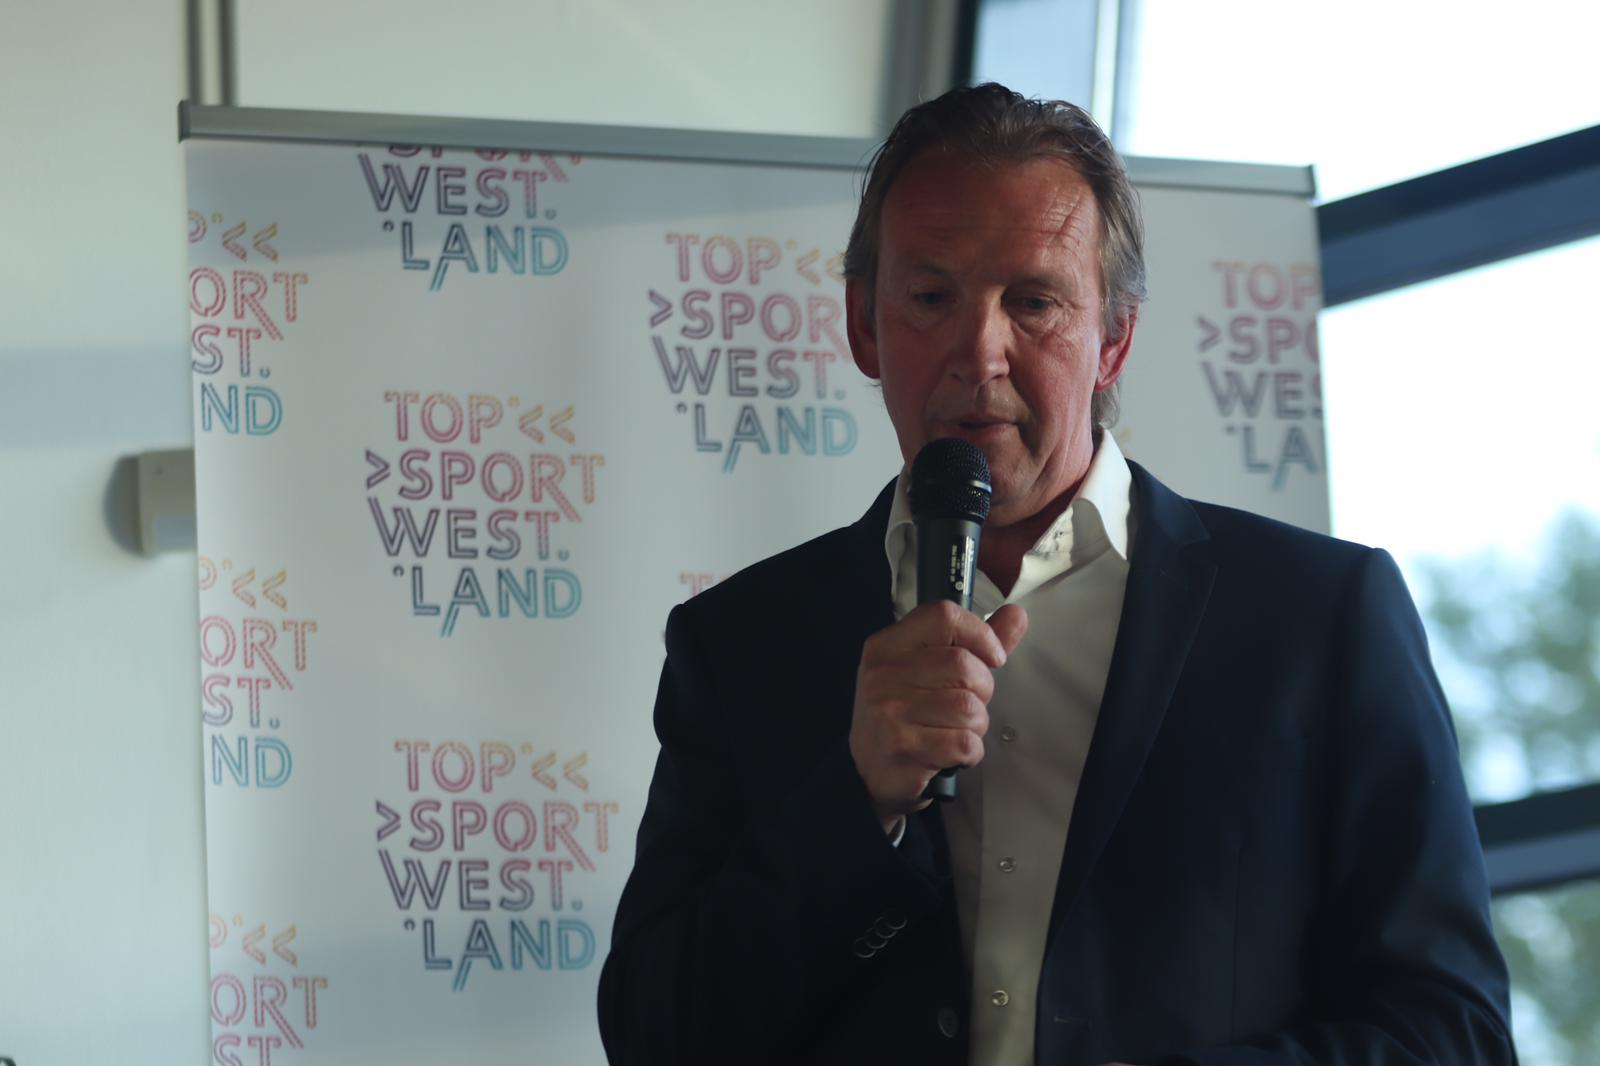 Digitale meet-up topsport Westland op 7 december